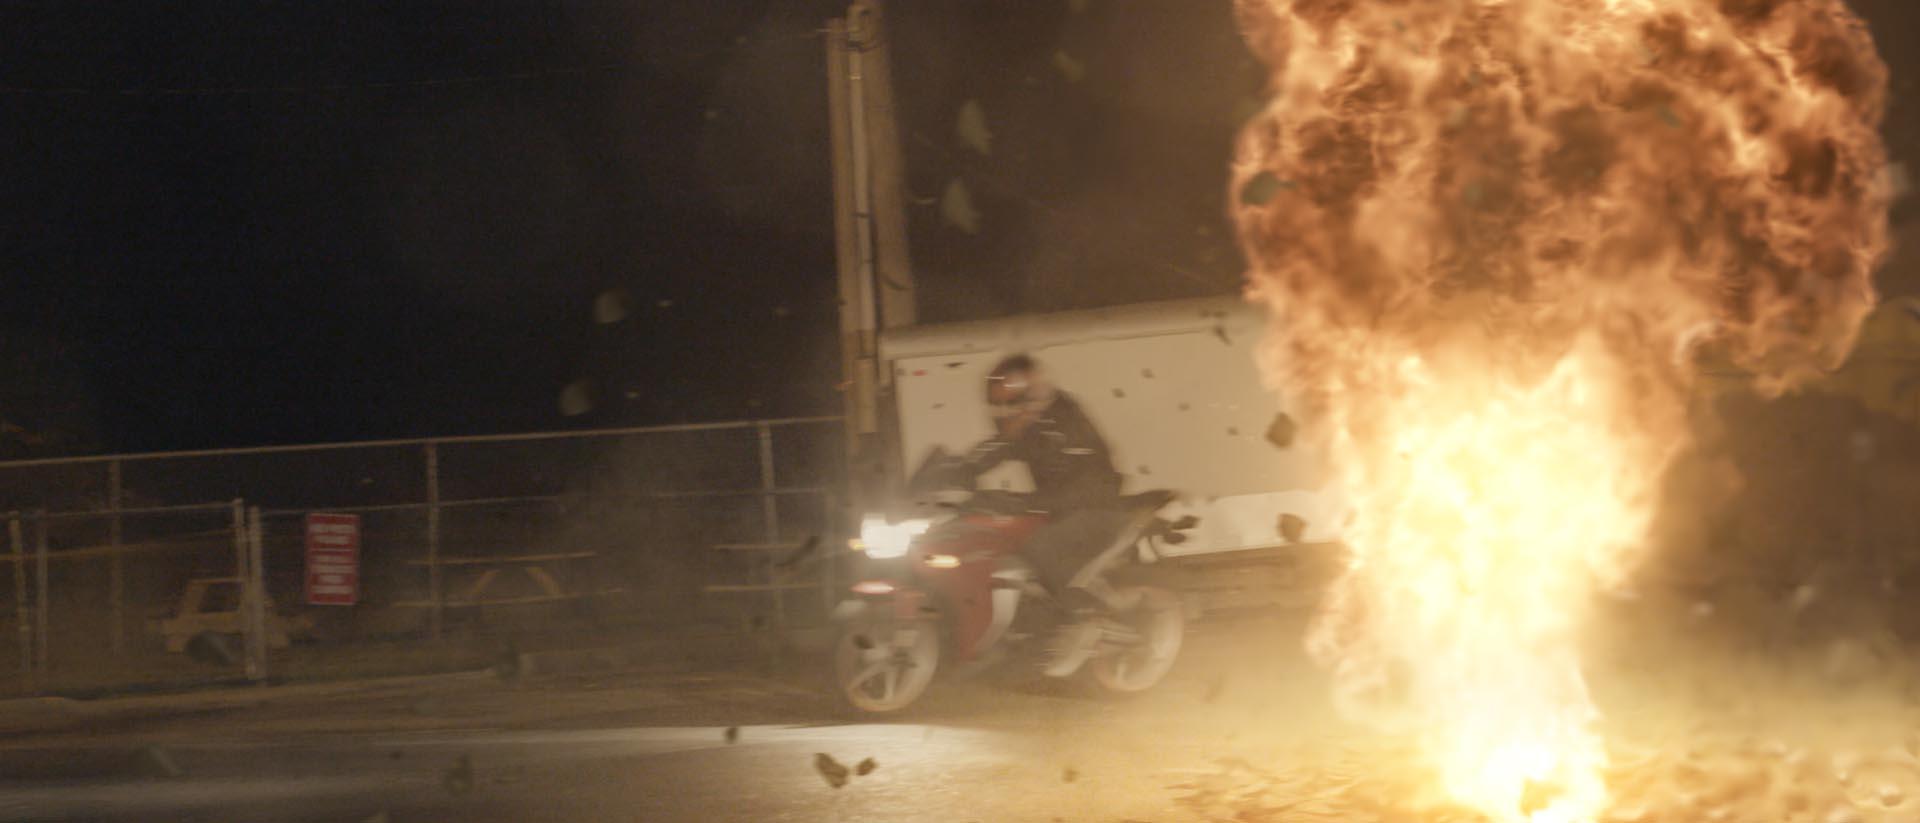 Bike explosion